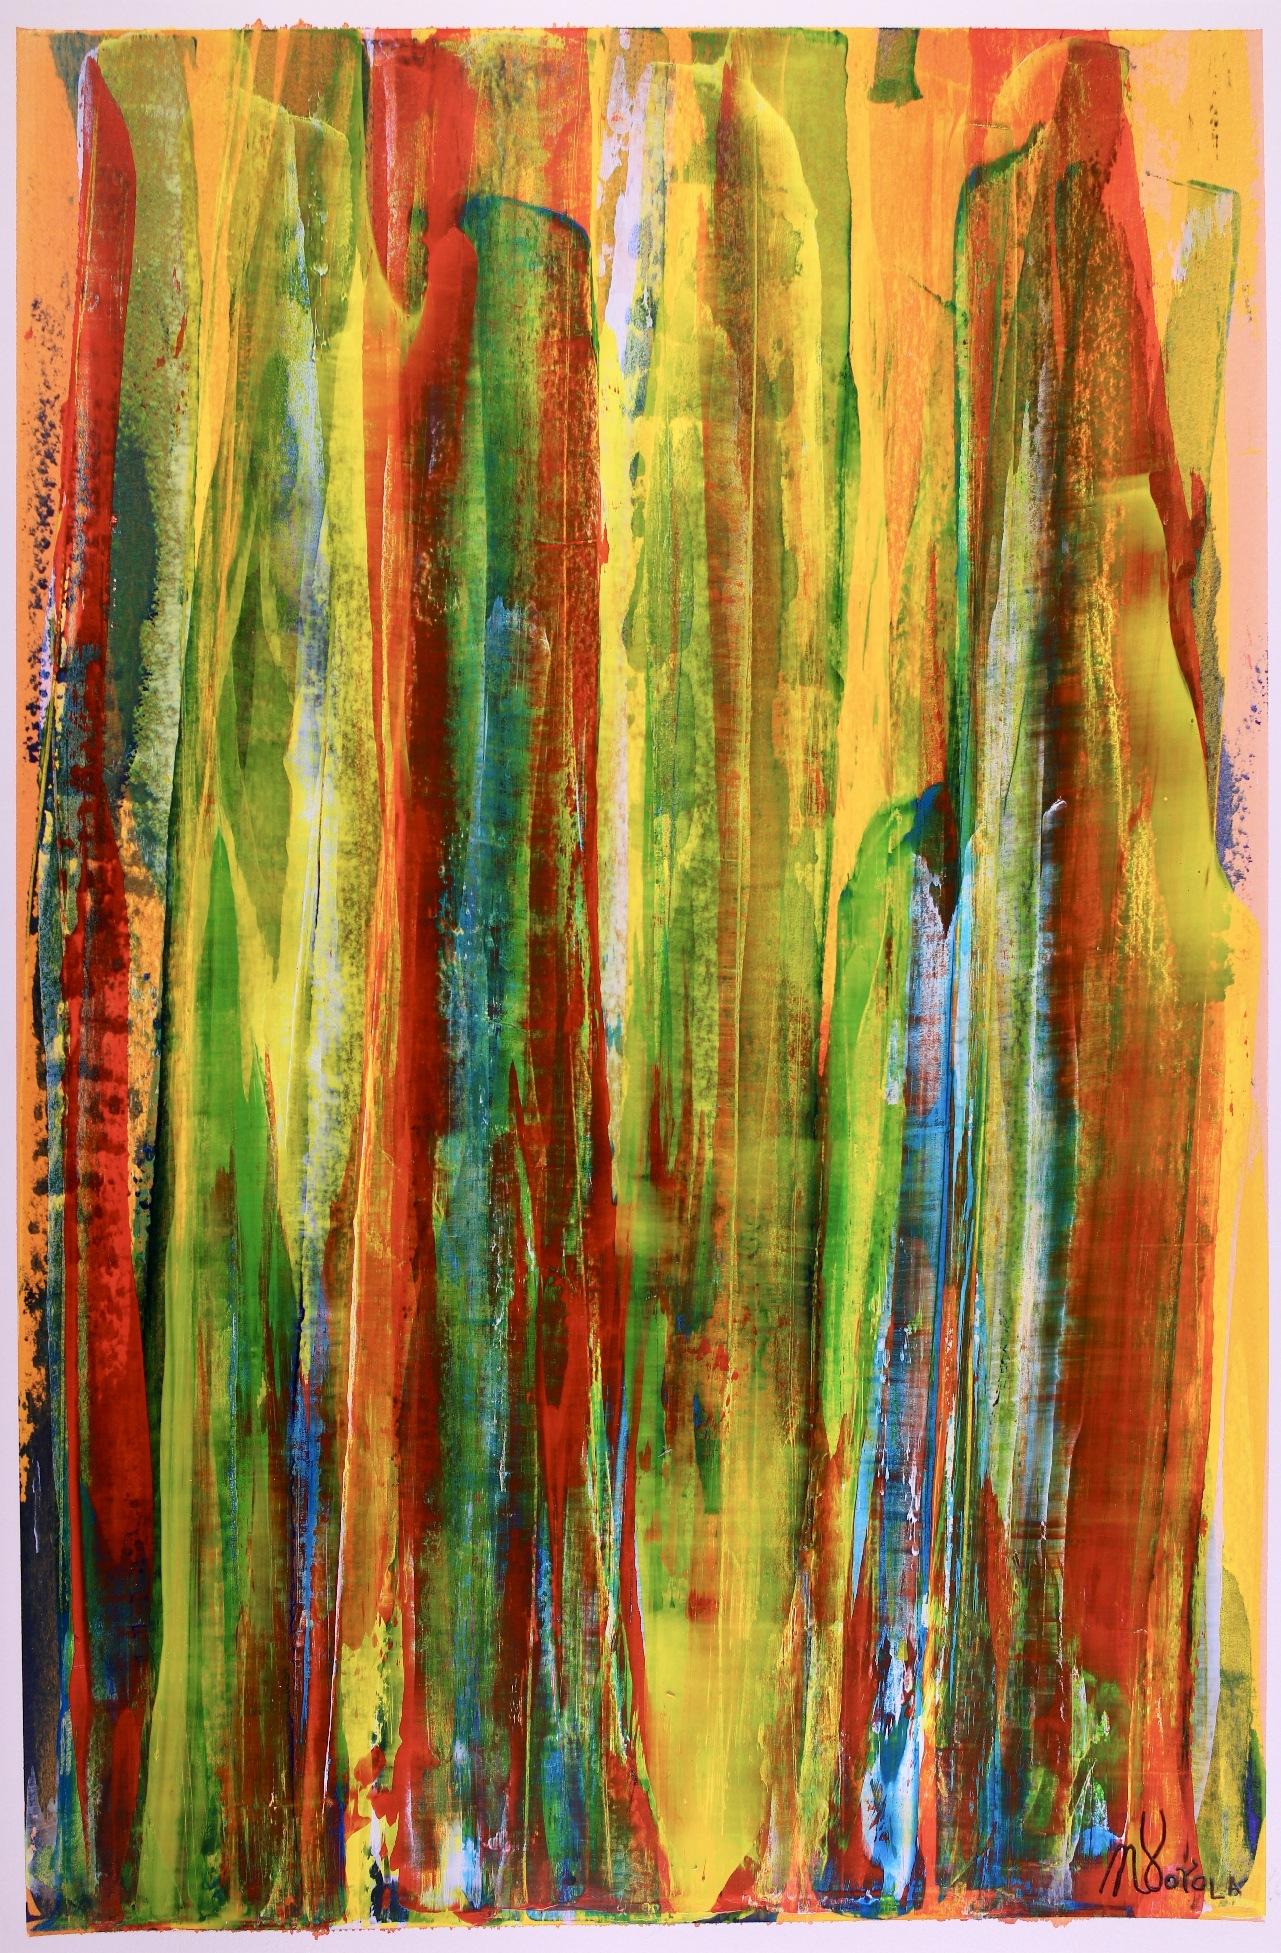 Nature uprising (2018) Art on paper by Nestor Toro